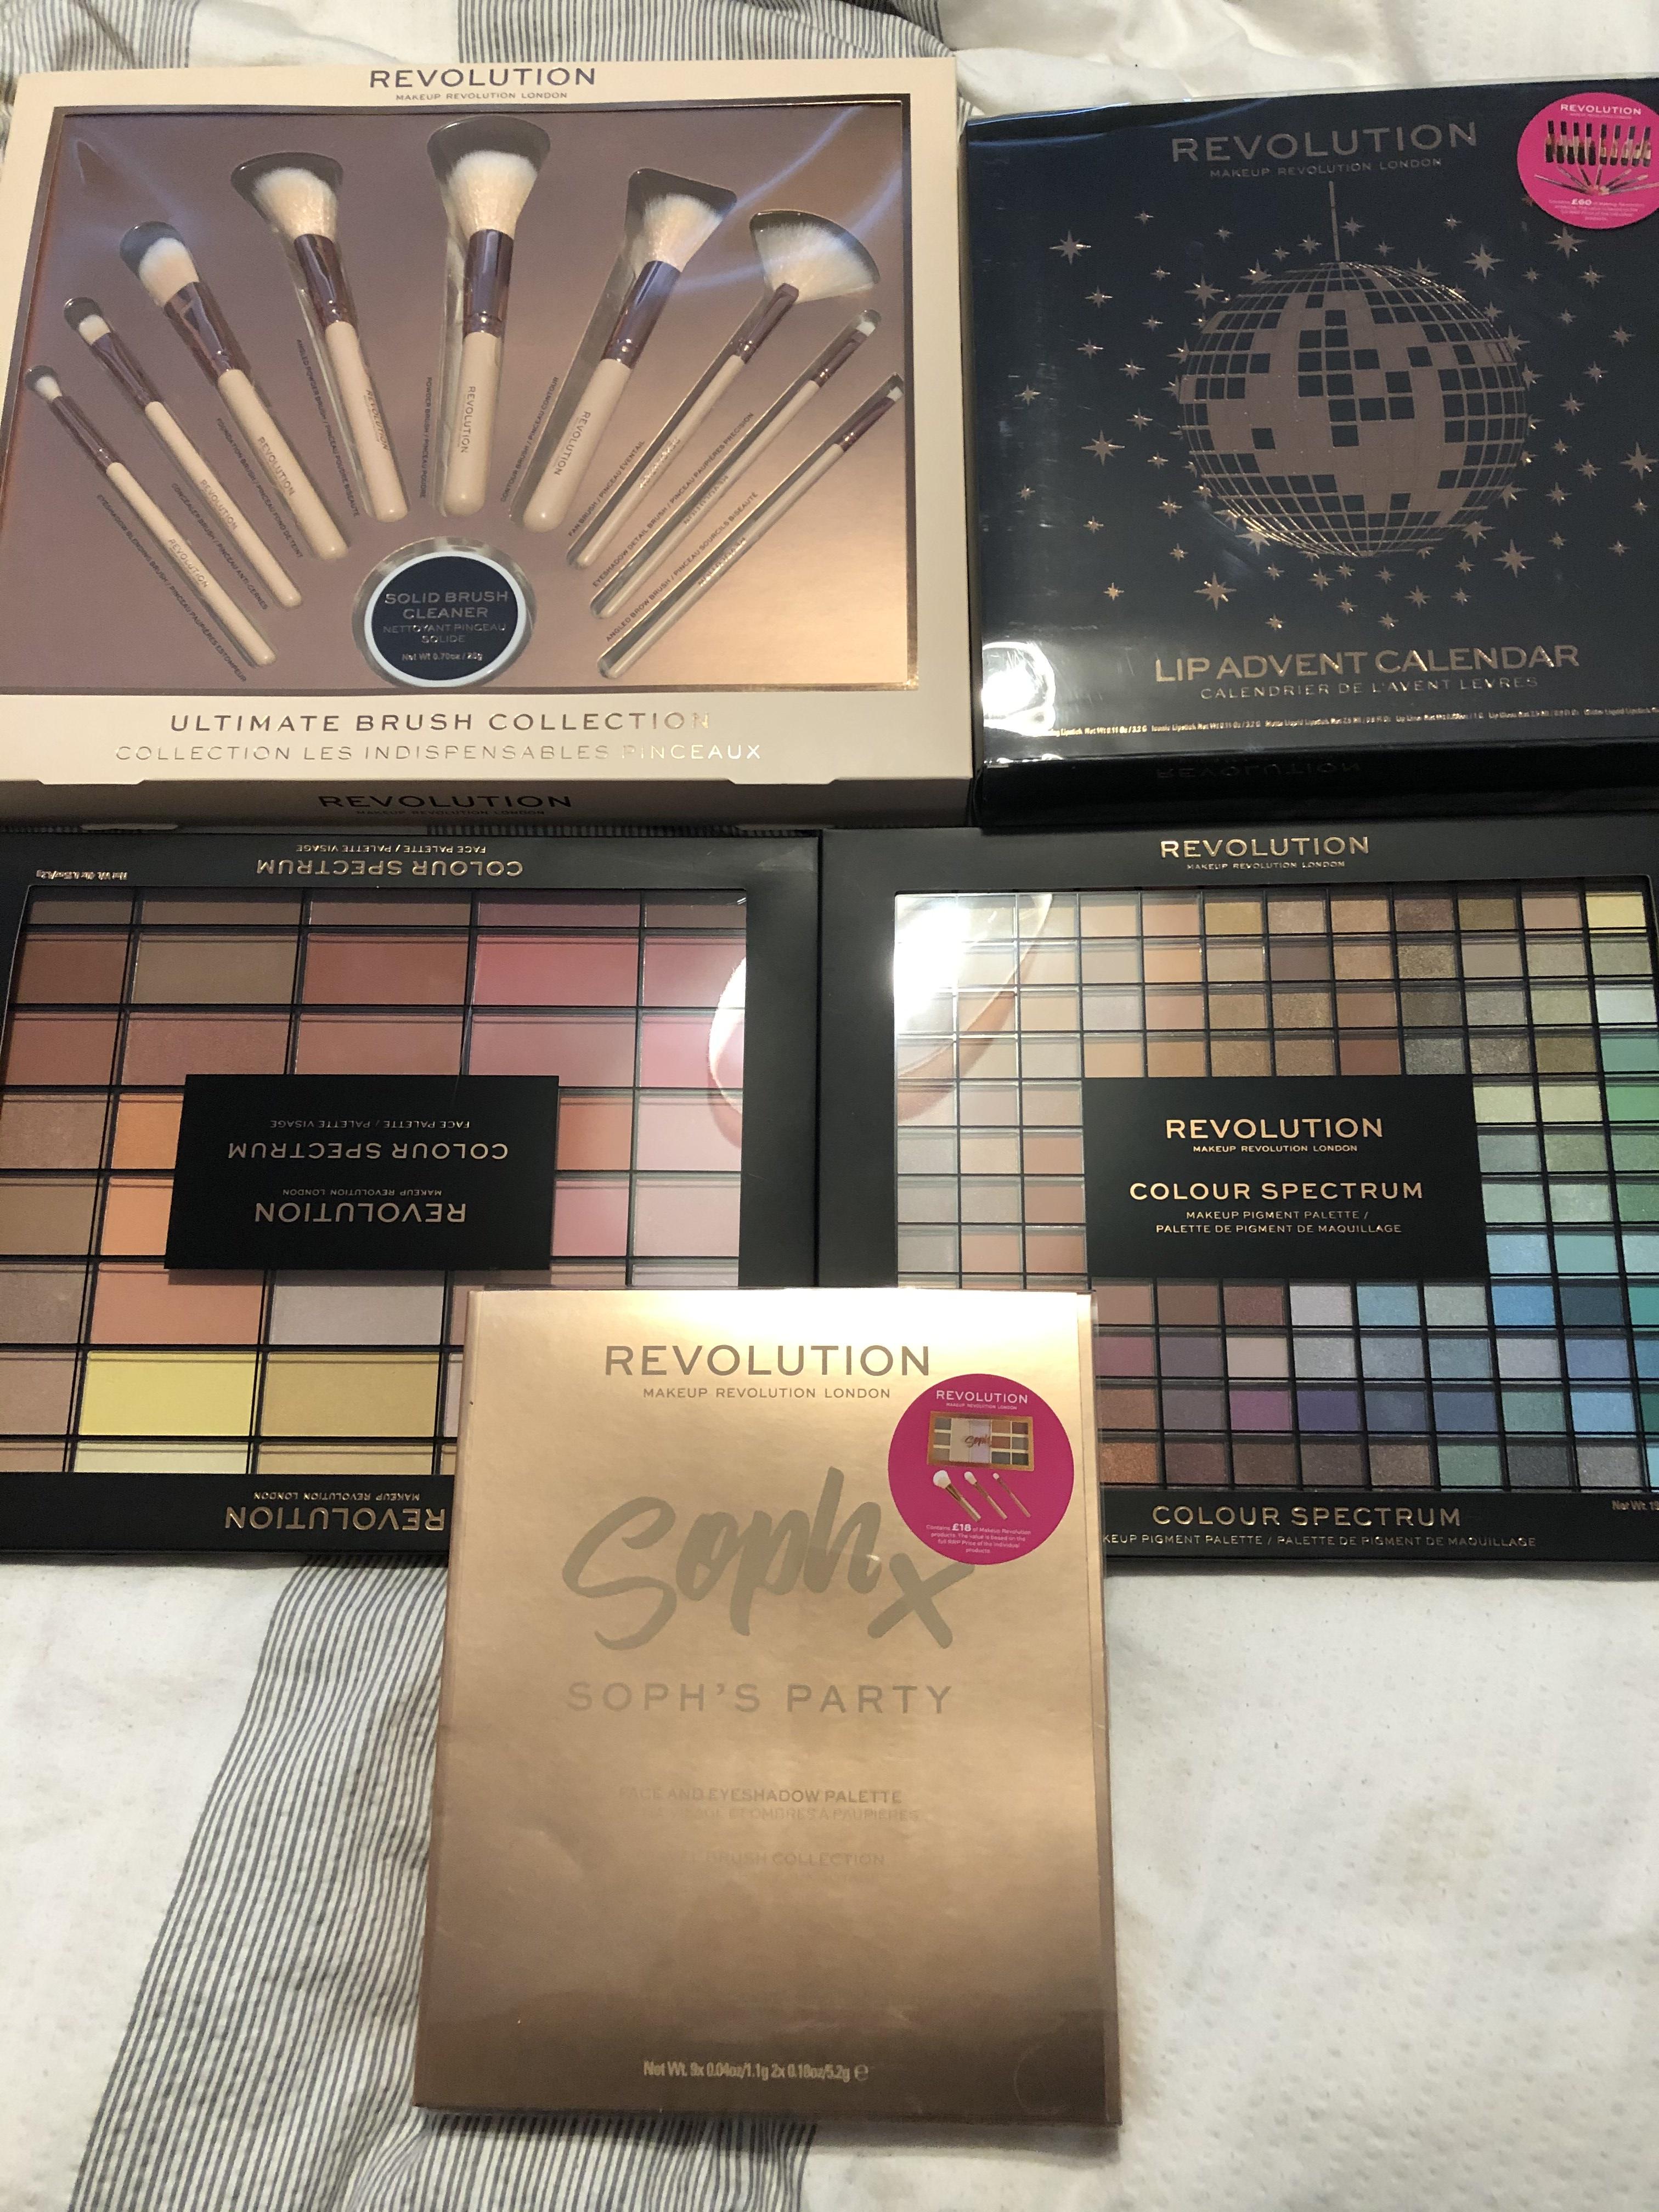 Revolution make up sets instore @ B&M e.g. make up brush set for £12